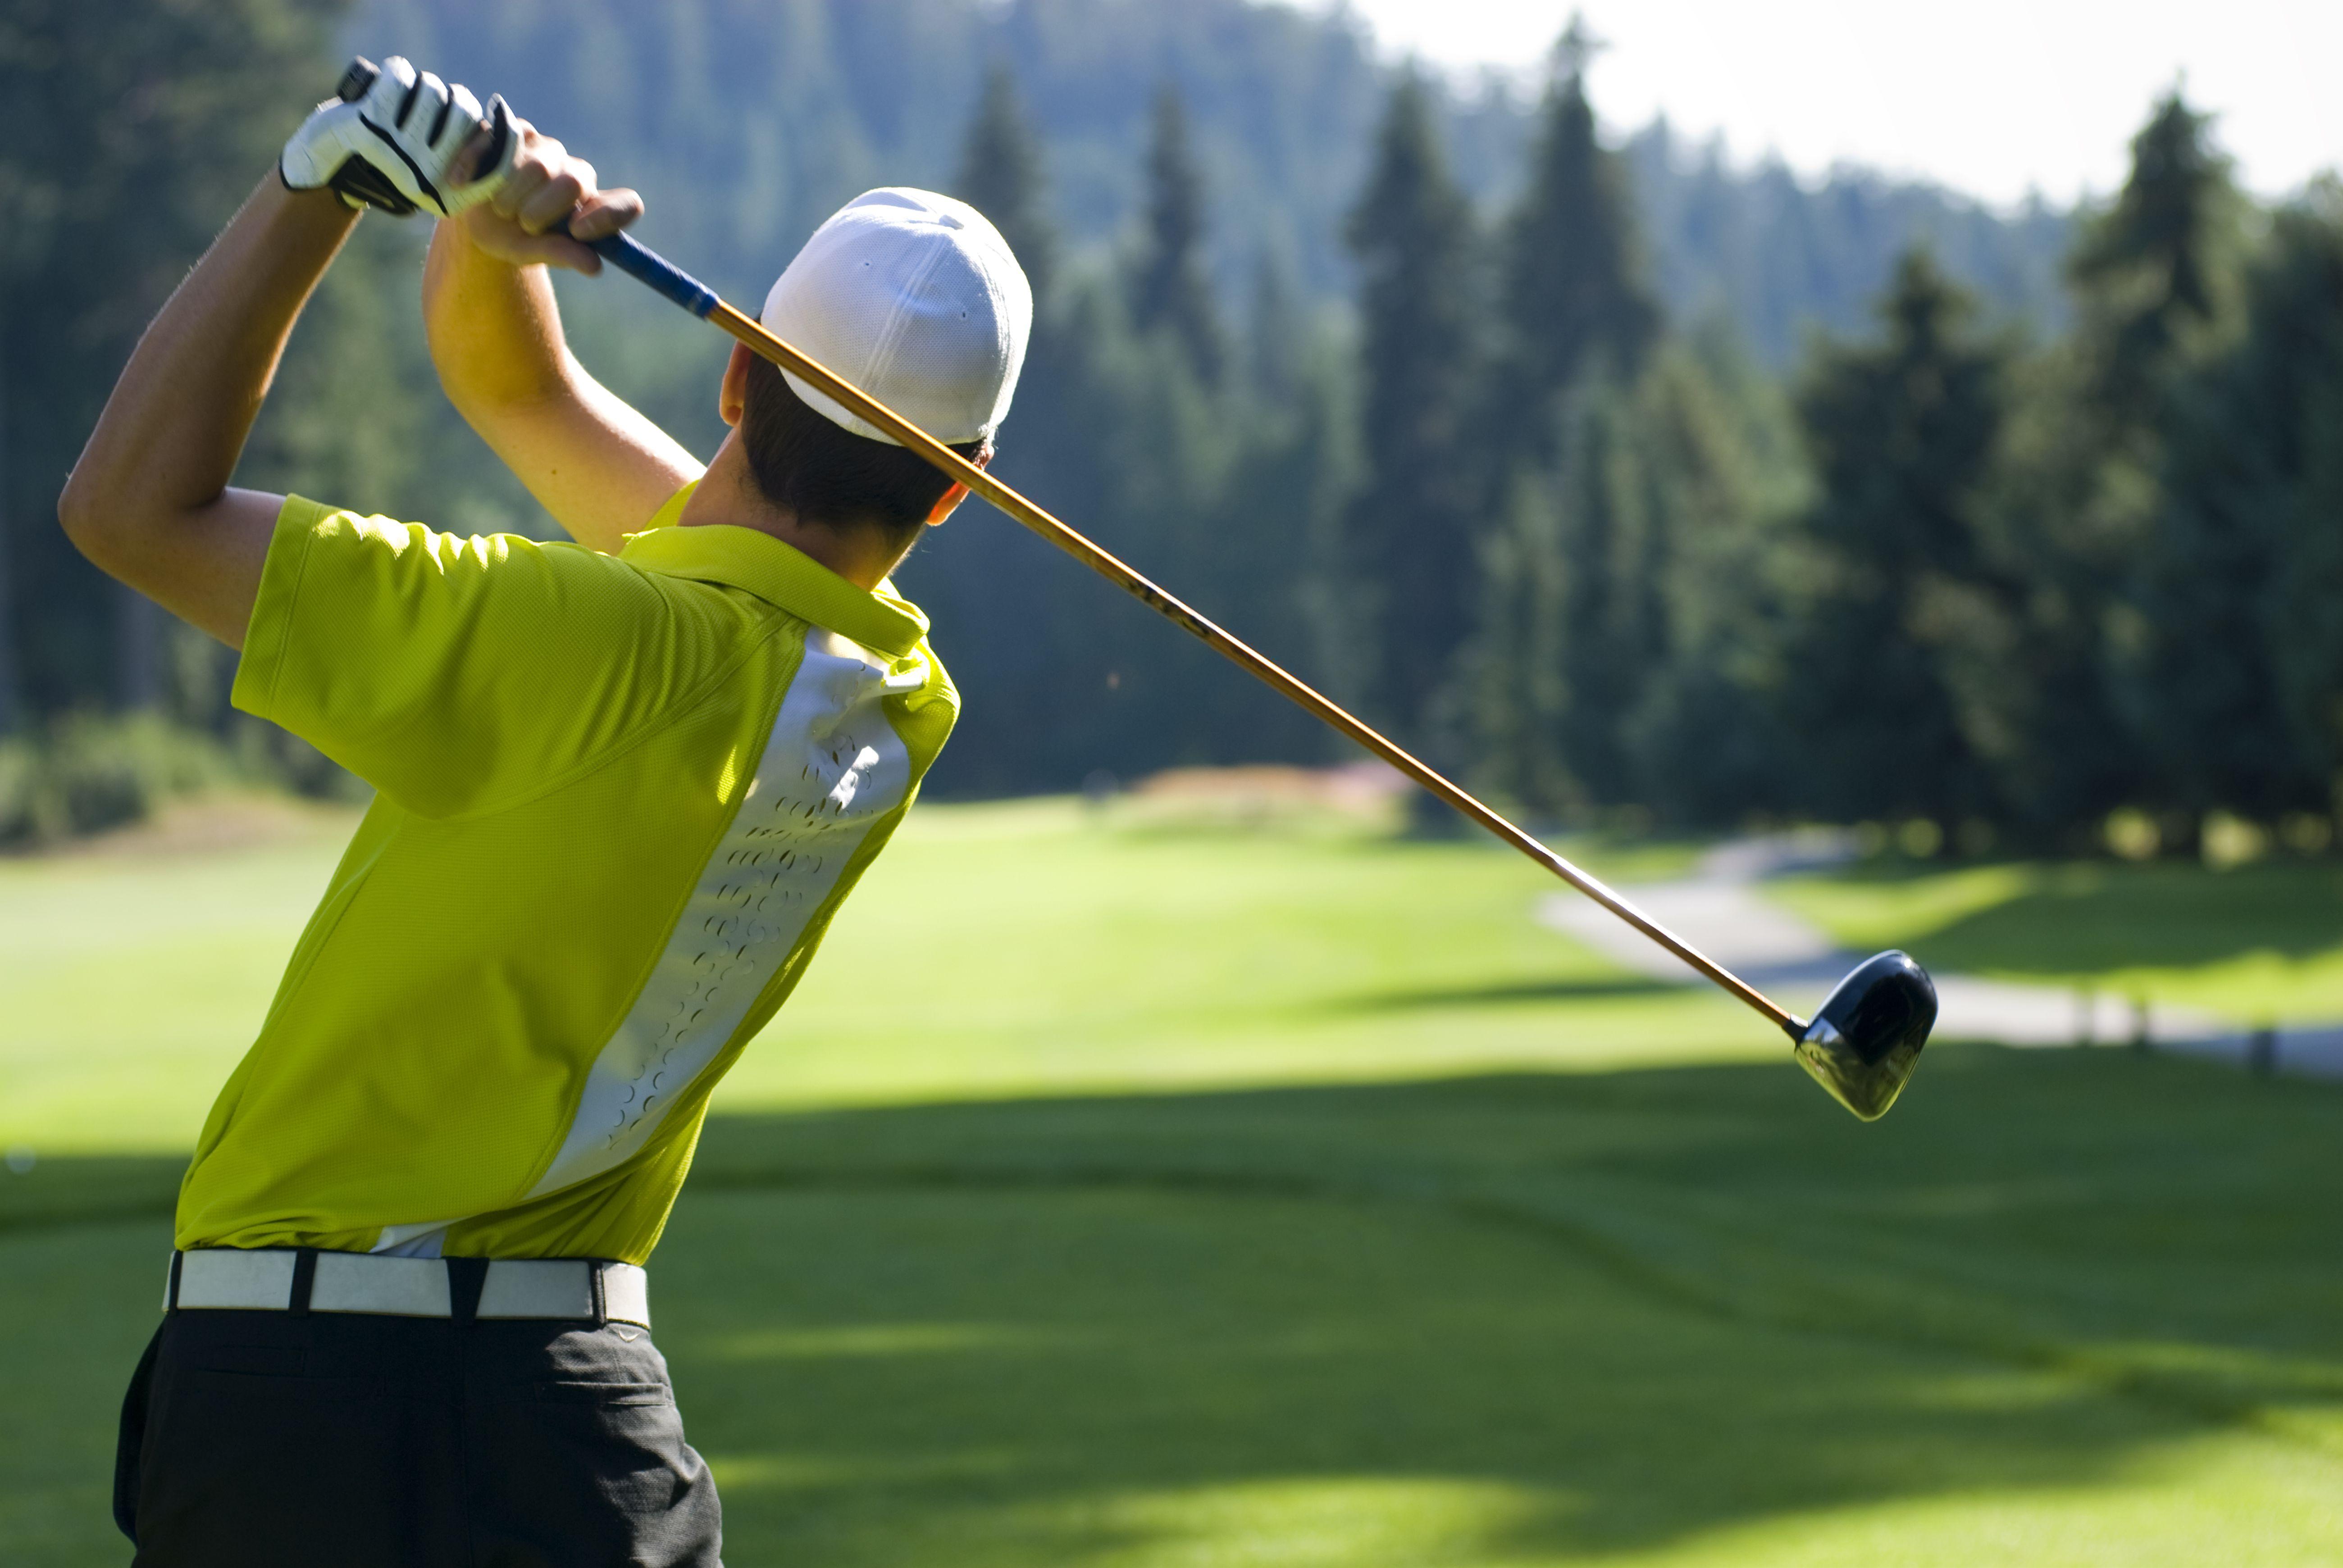 Golf Basics: Tips on the Fundamentals